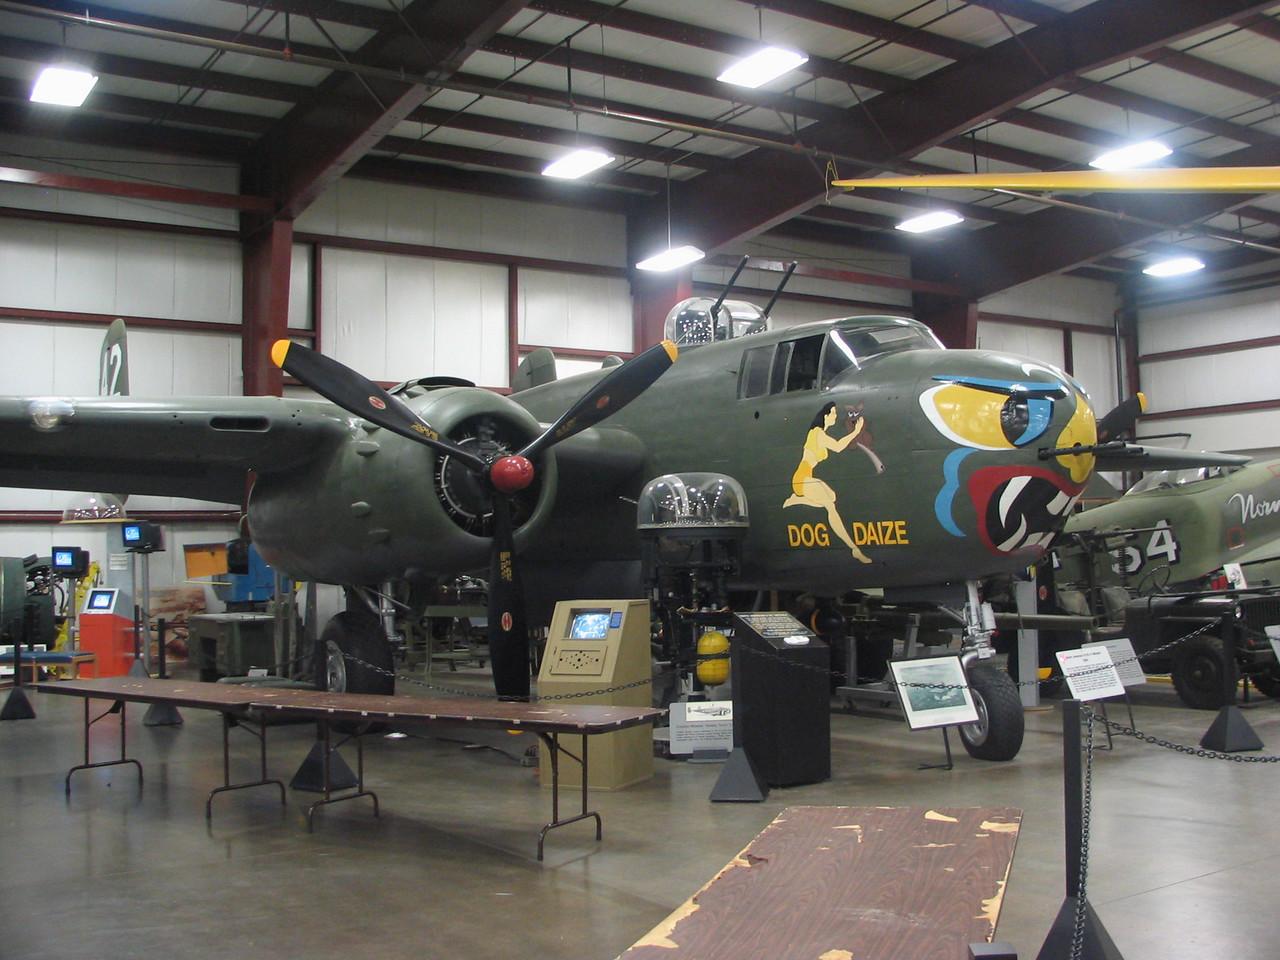 North American B-25H Mitchell bomber